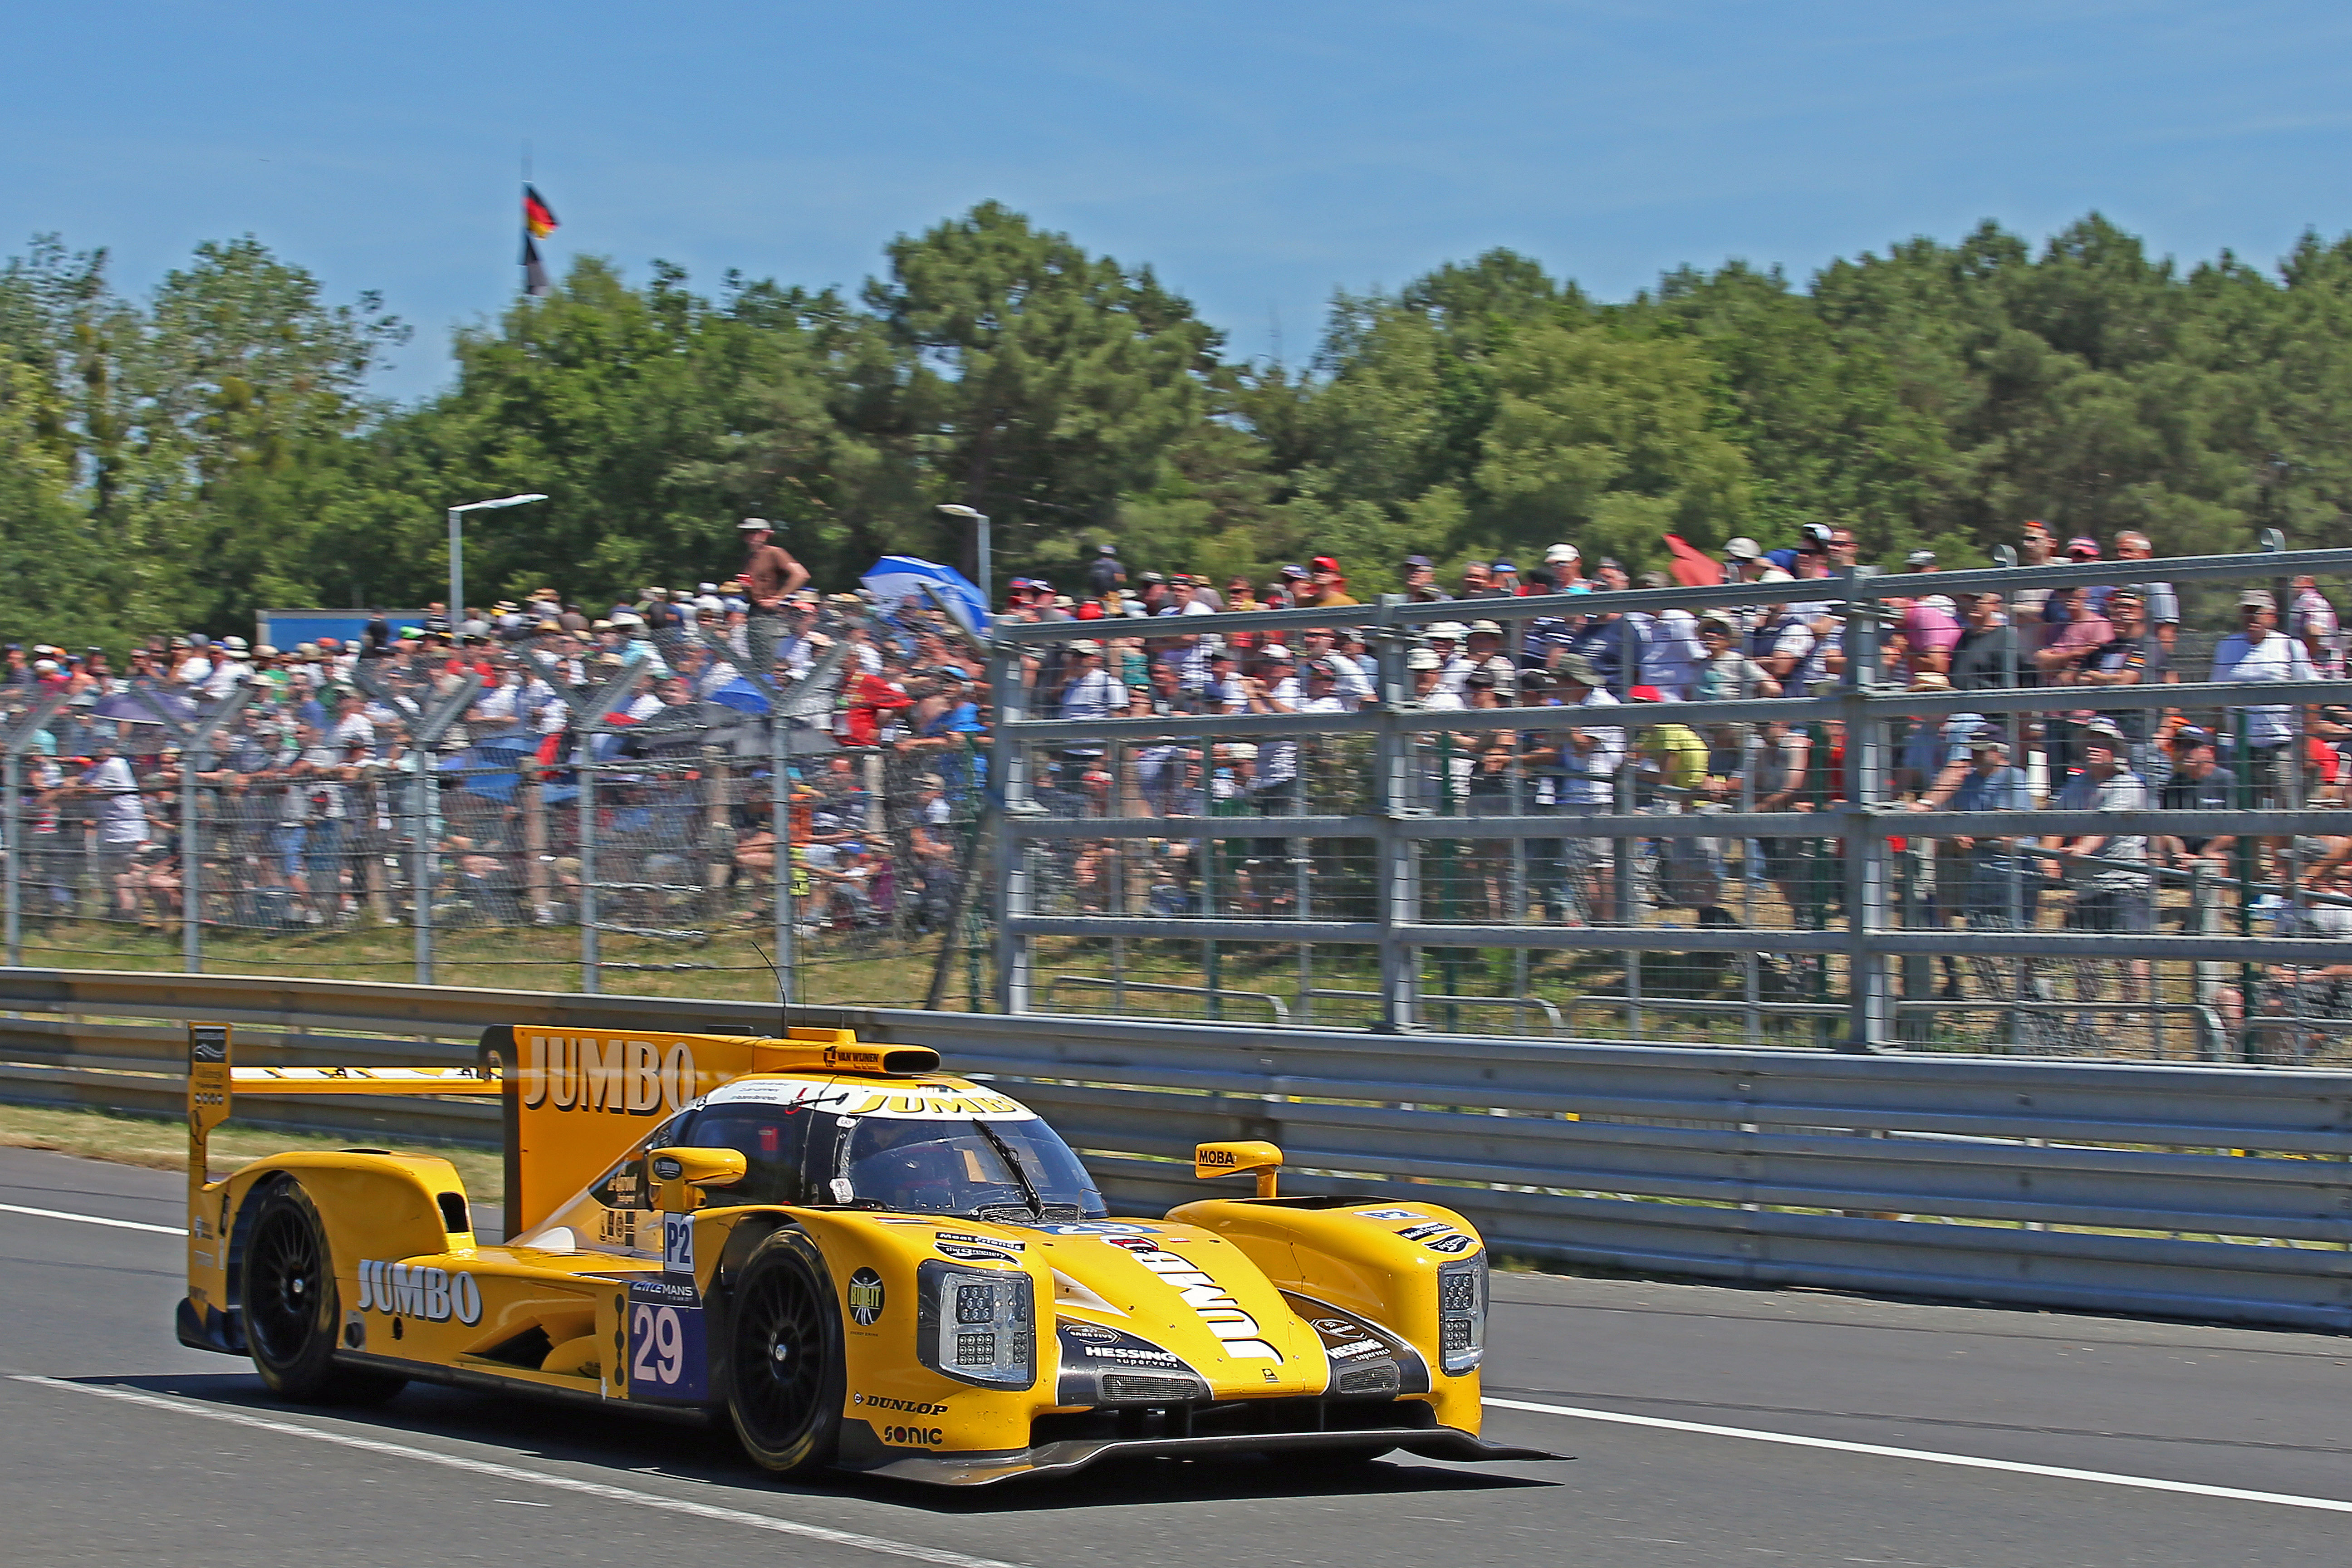 Jan Lammers Rubens Barrichello Team Nederland Le Mans 2017